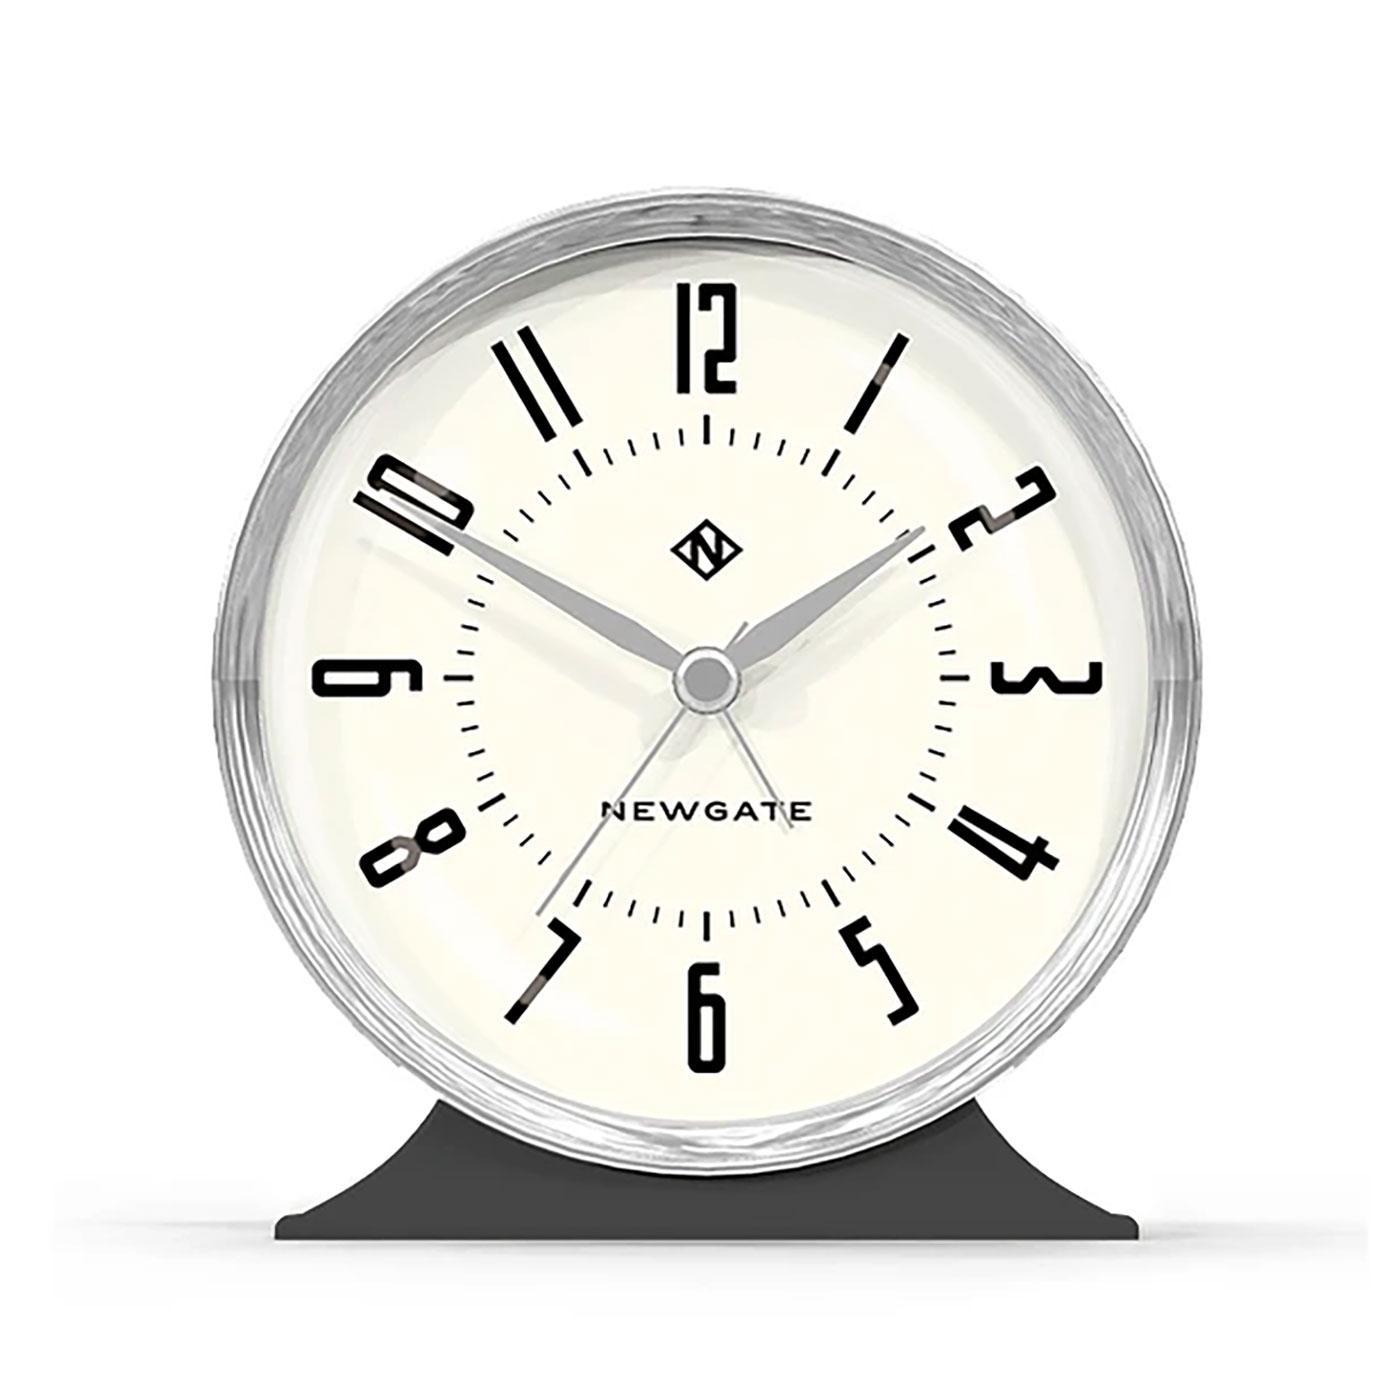 The Hotel NEWGATE CLOCKS Art Deco Alarm Clock